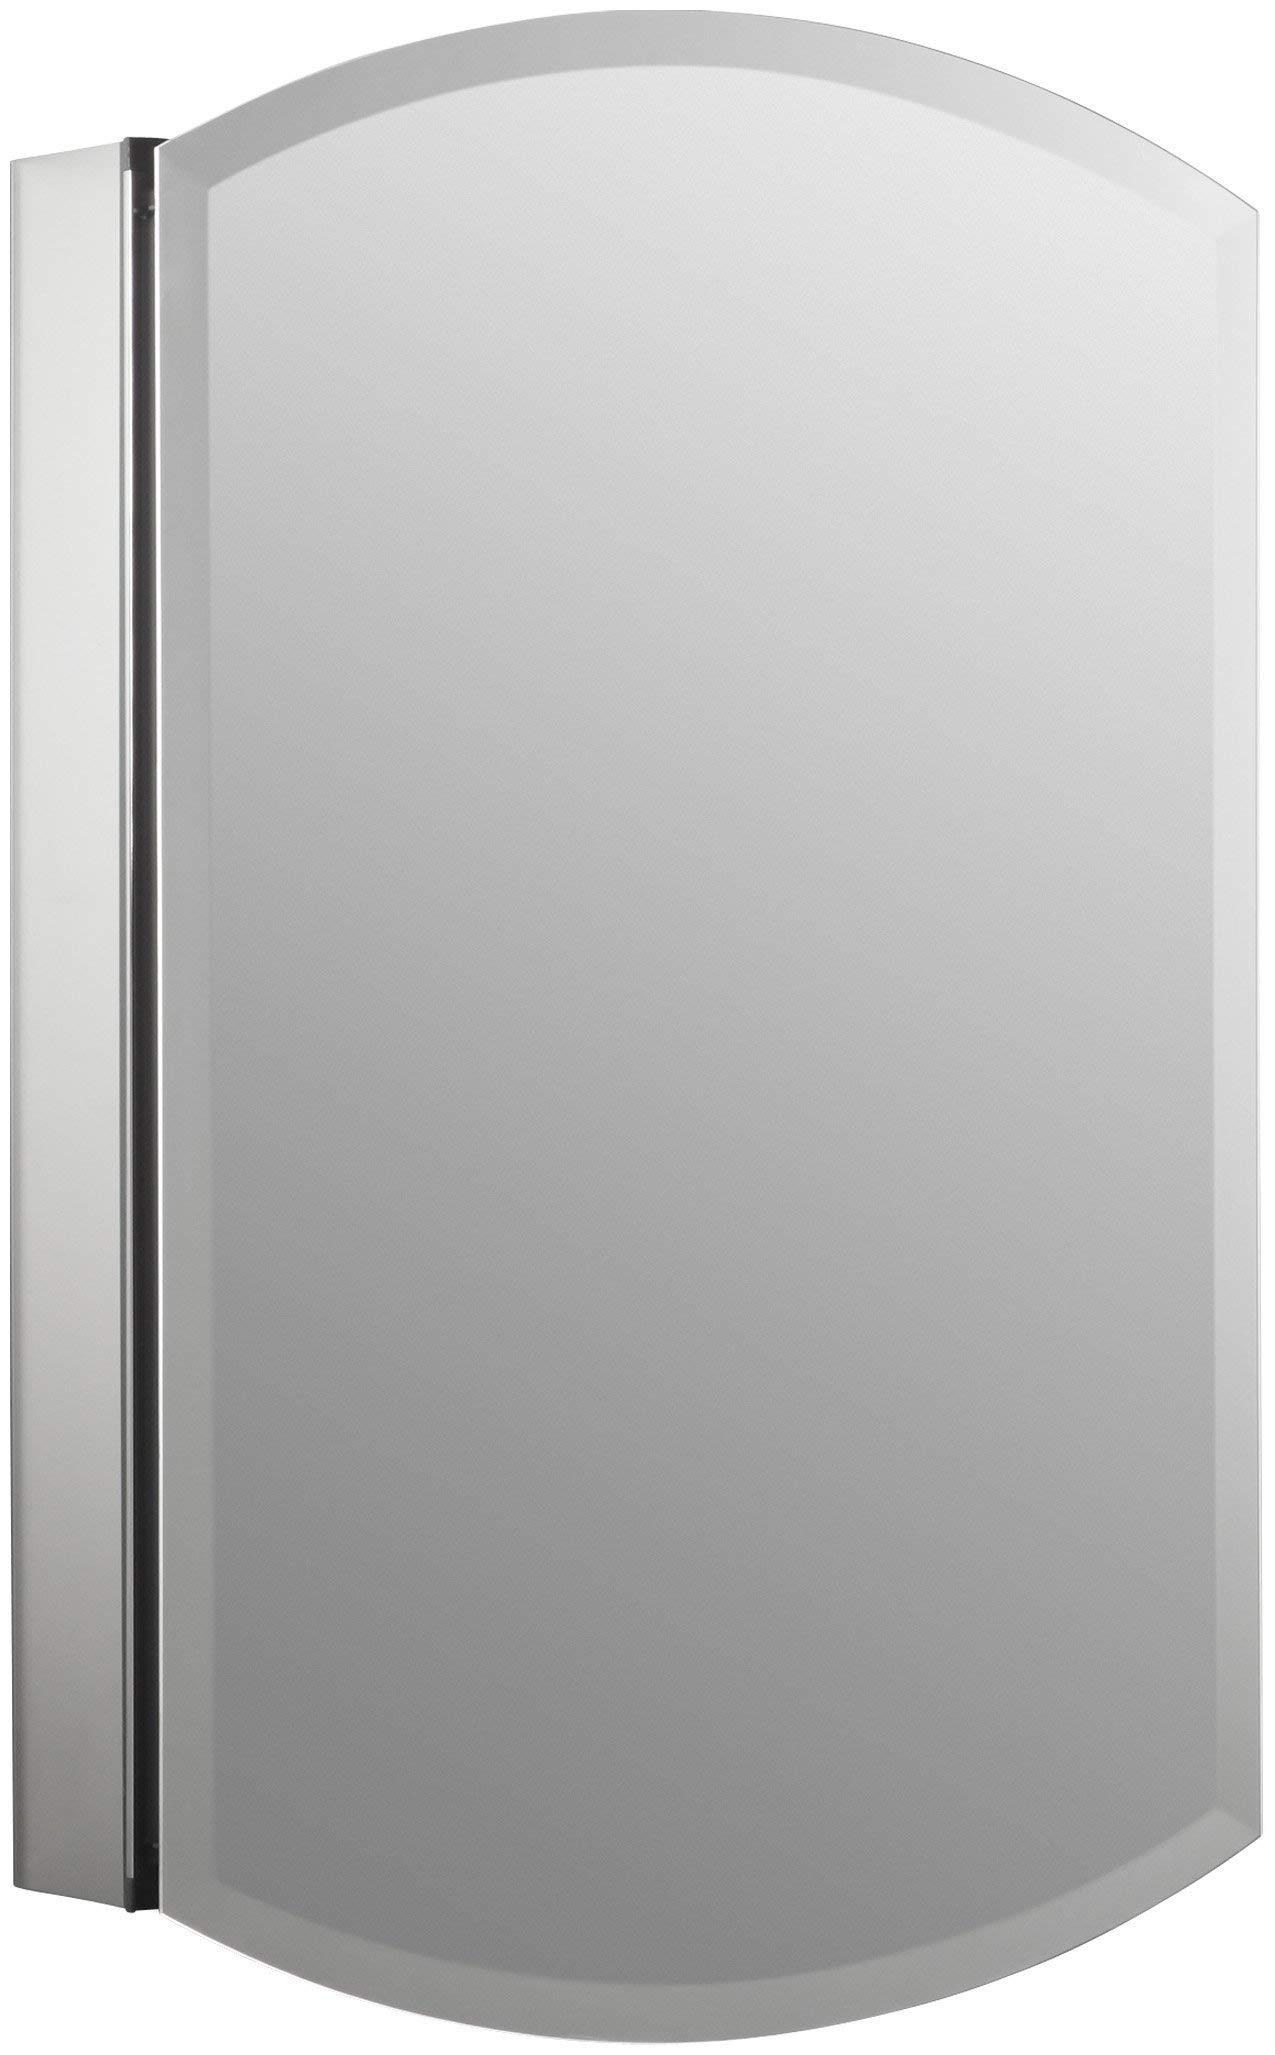 KOHLER K-3073-NA Archer Frameless 20 inch x 31 inch Aluminum Bathroom Medicine Cabinet; ; Recess or Surface Mount (Renewed)